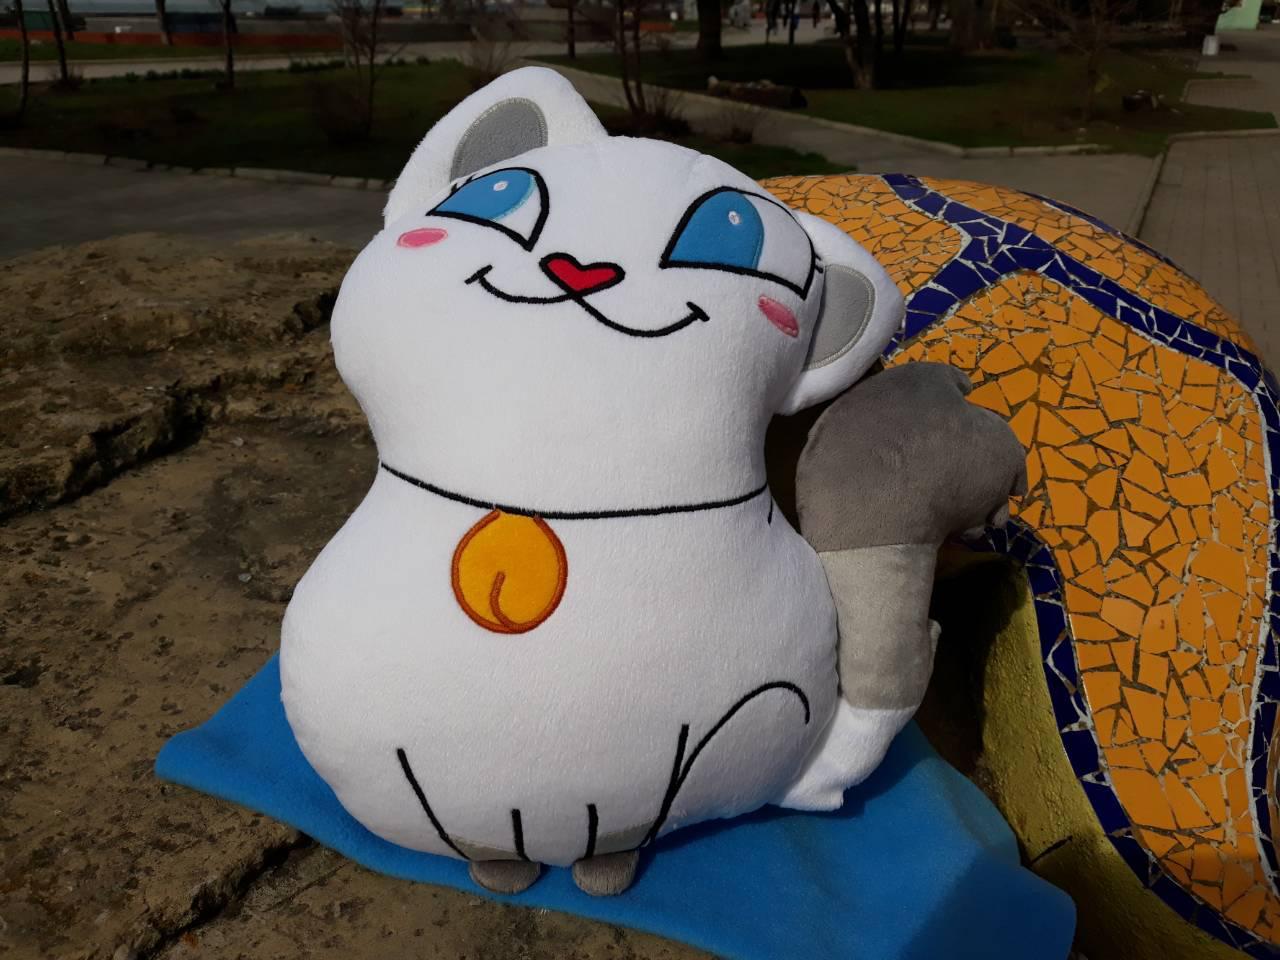 Мягкая игрушка Кошка Лола Lola Viber, стикер Вайбер ручная работа